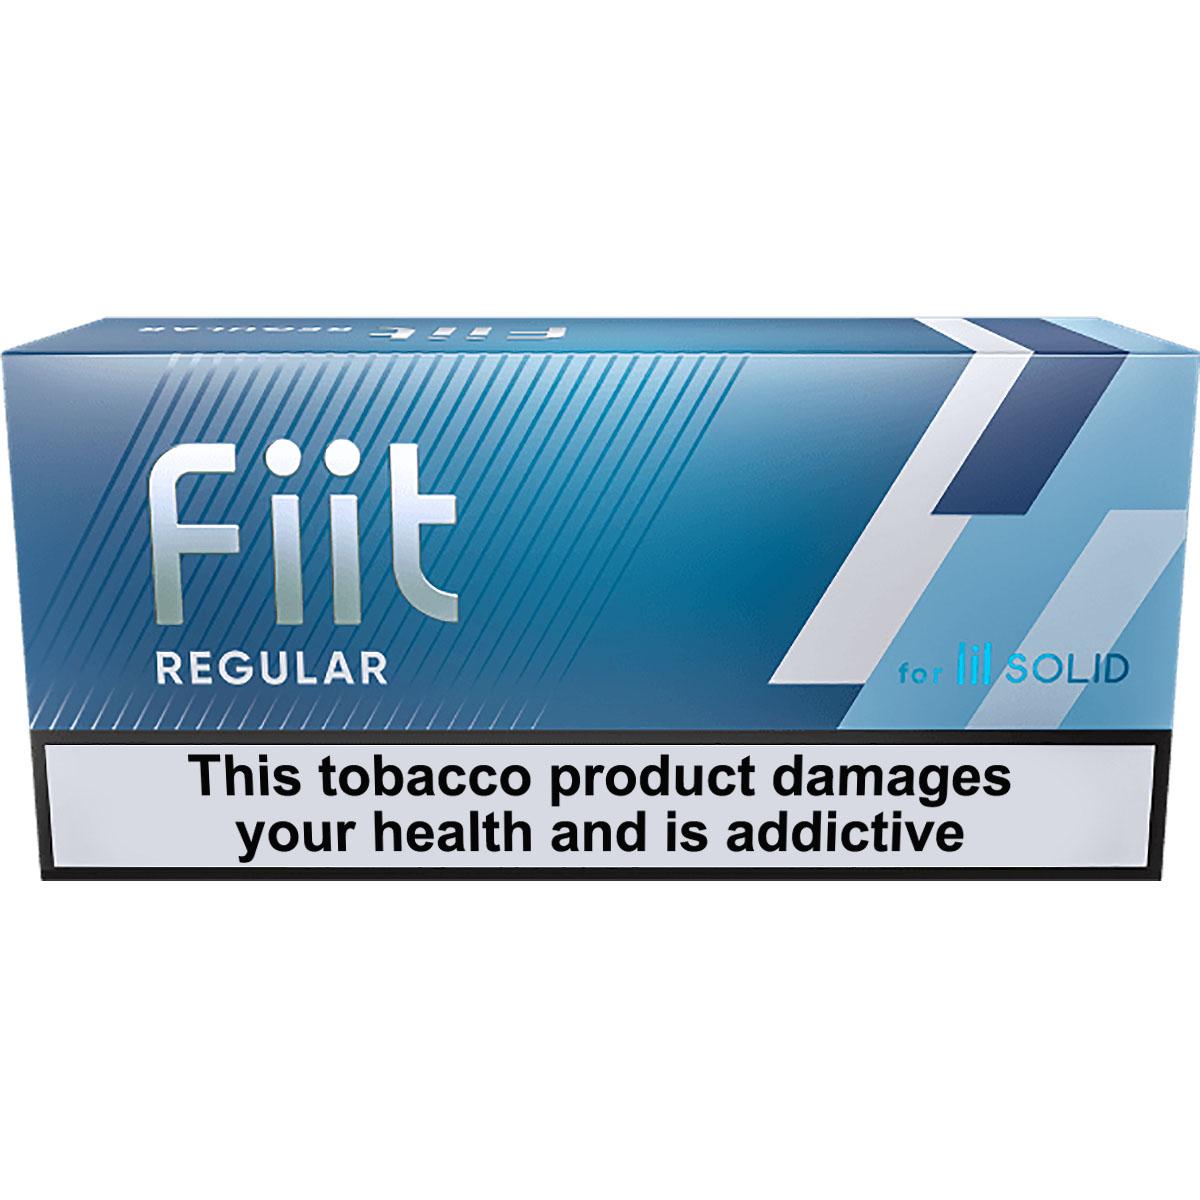 Fiit - Regular